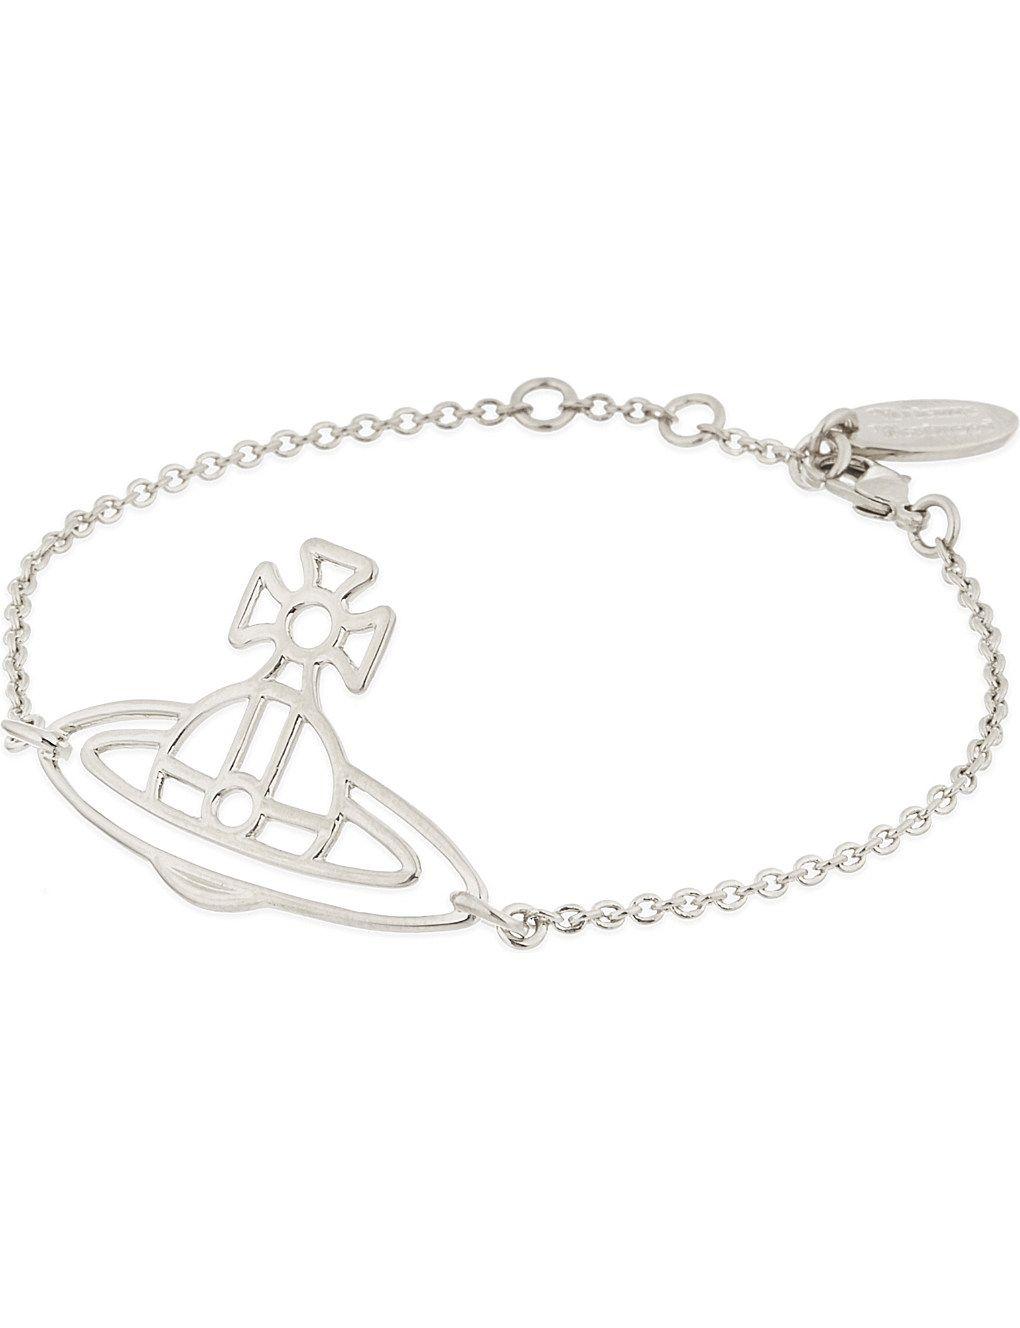 434383a92 VIVIENNE WESTWOOD JEWELRY - Thin Lines flat orb bracelet | Selfridges.com